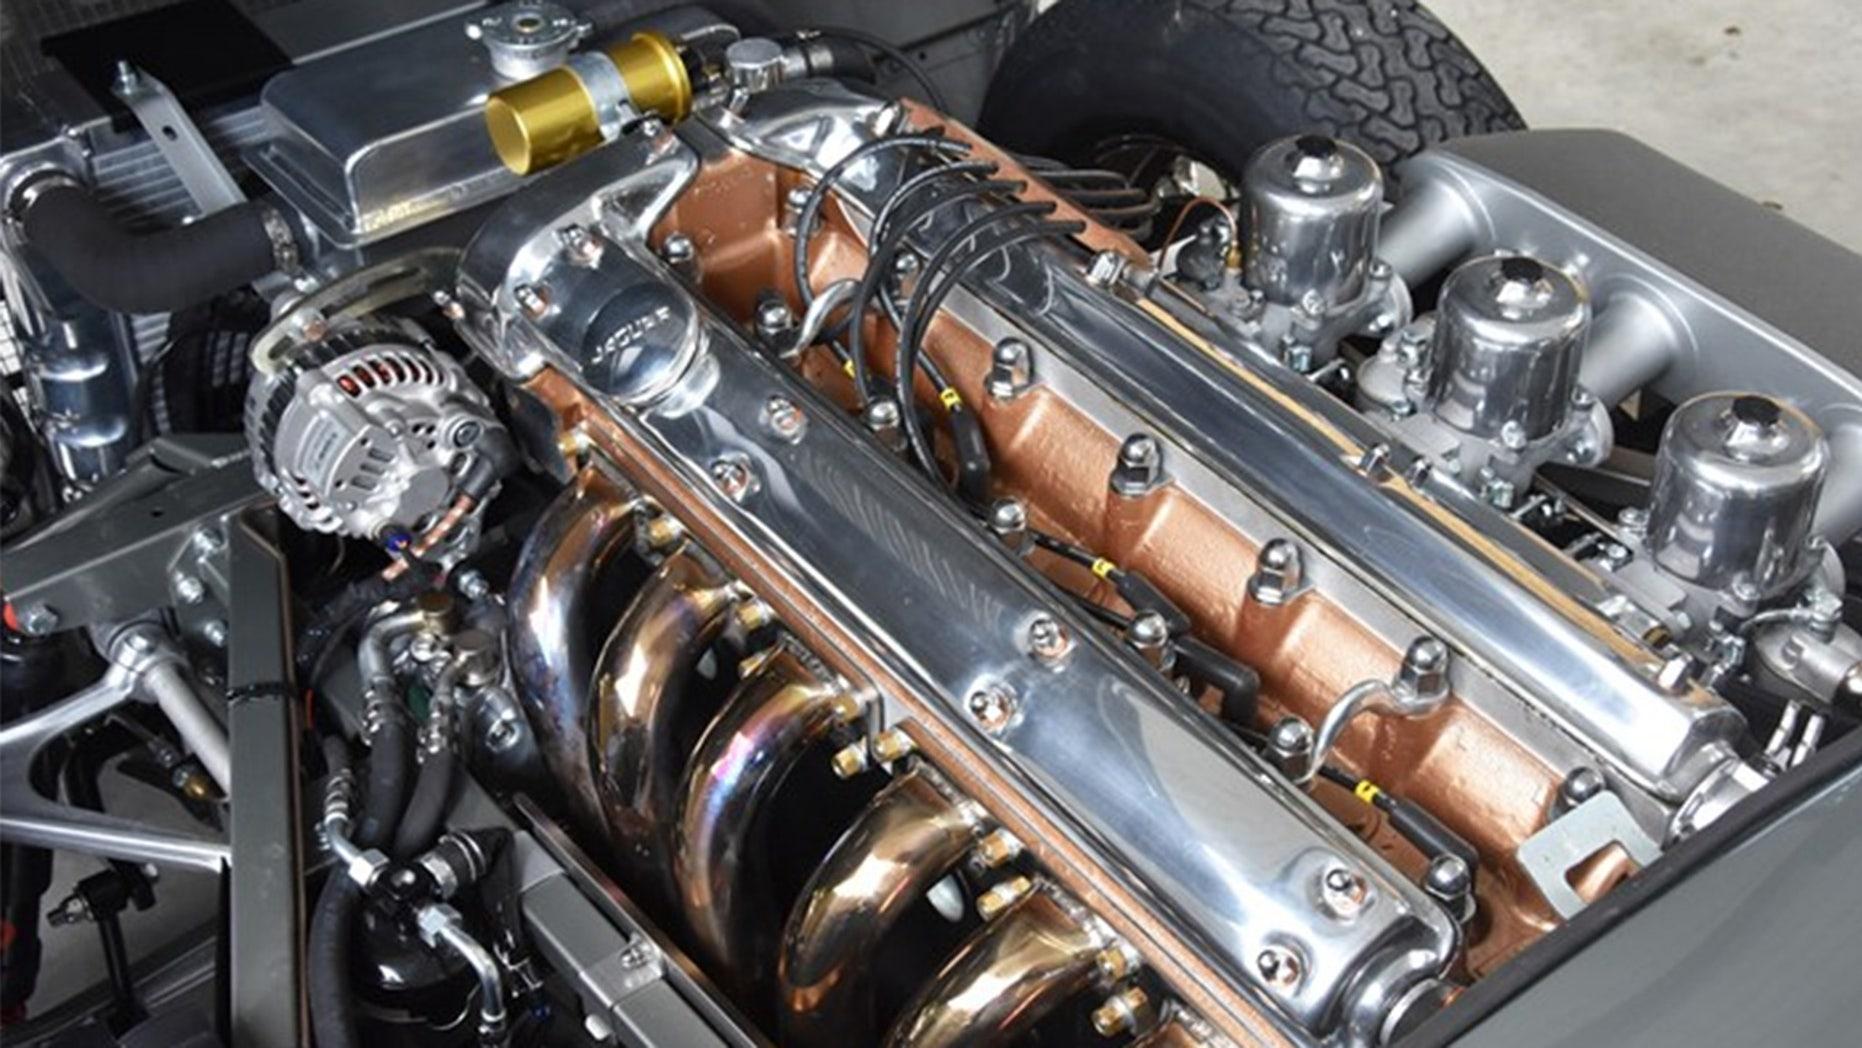 1964 Jaguar E-Type engine